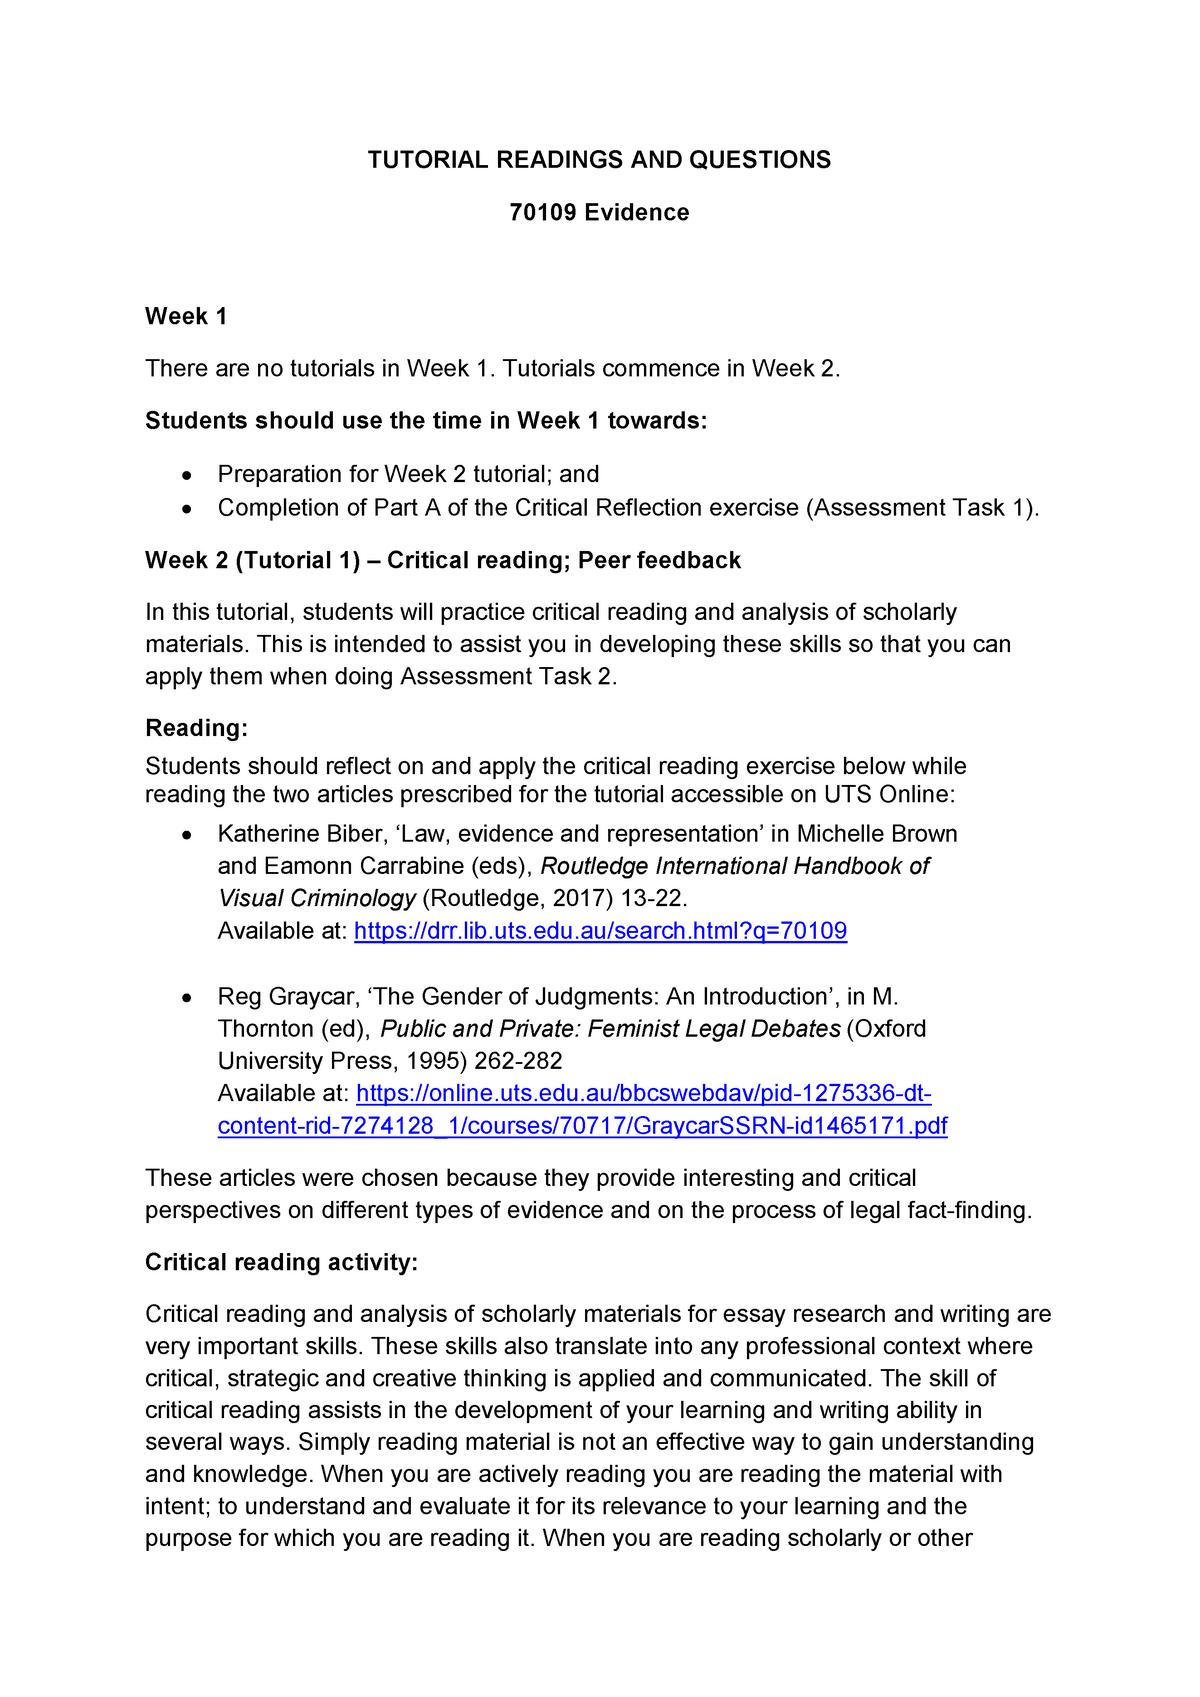 Student Tutorial Materials - 070109 Evidence - UTS - StuDocu